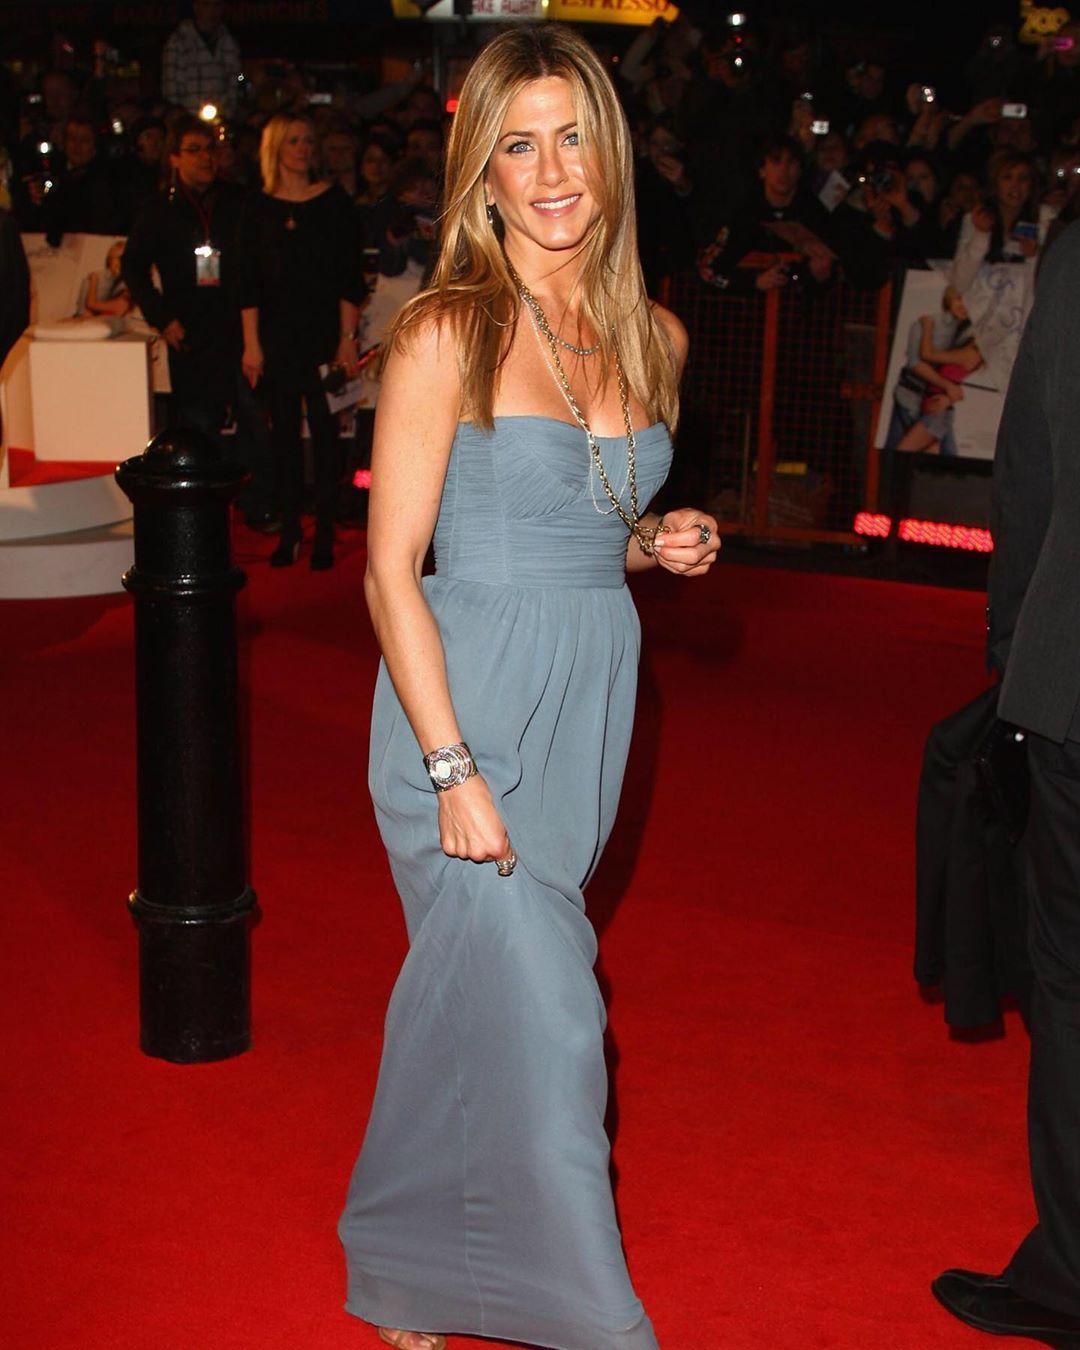 Happy 2020 Jennifer Aniston Jenniferaniston Rachel Green Rachelgreen Friends Ac Gorgeous Dresses Strapless Dress Formal Jennifer Aniston Pictures [ 1350 x 1080 Pixel ]